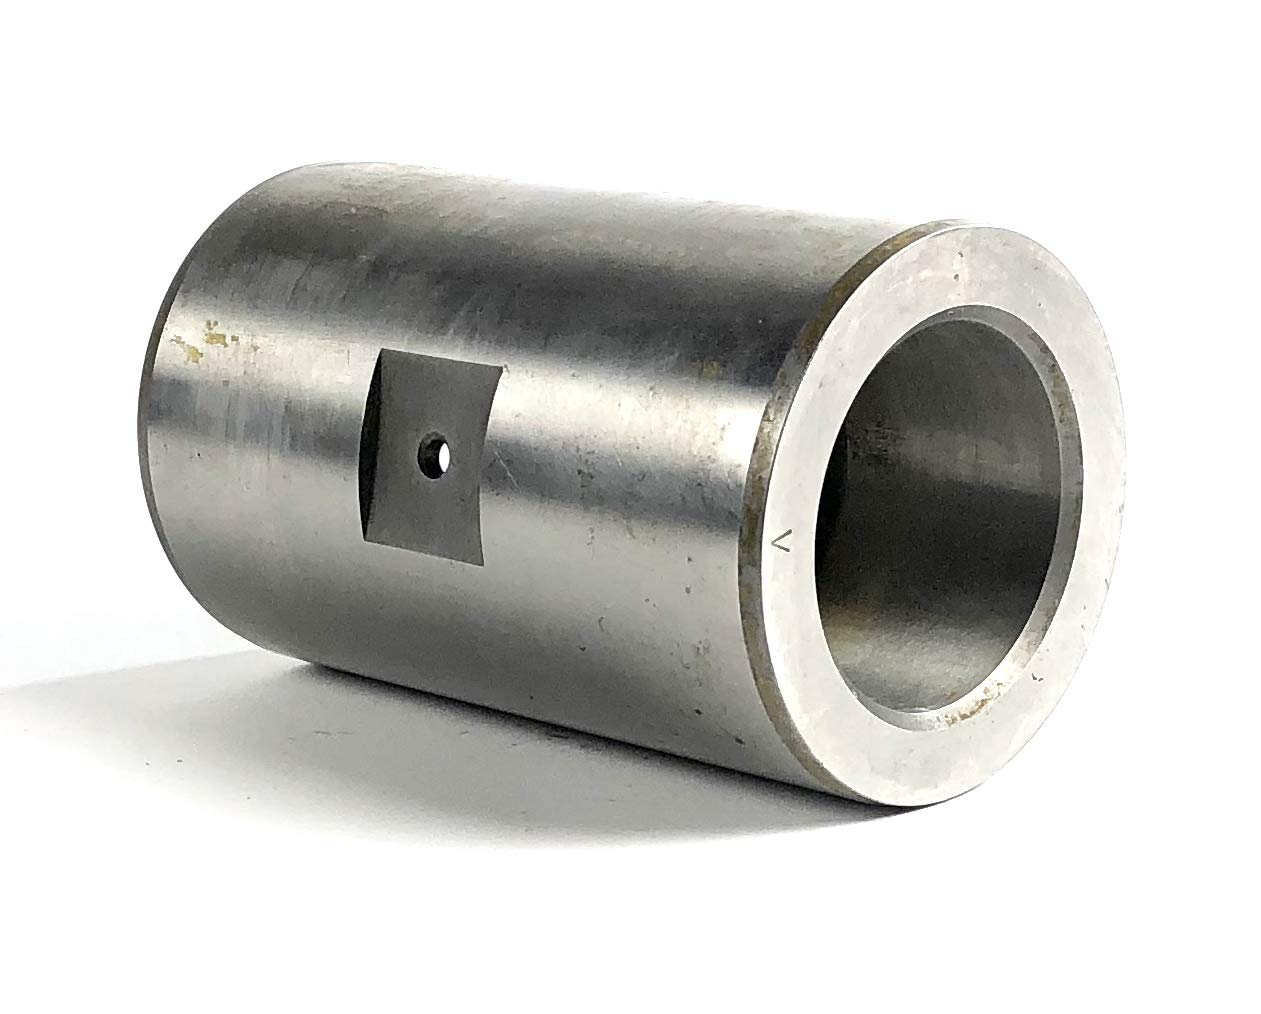 980C Fits 9V1883 Bearing